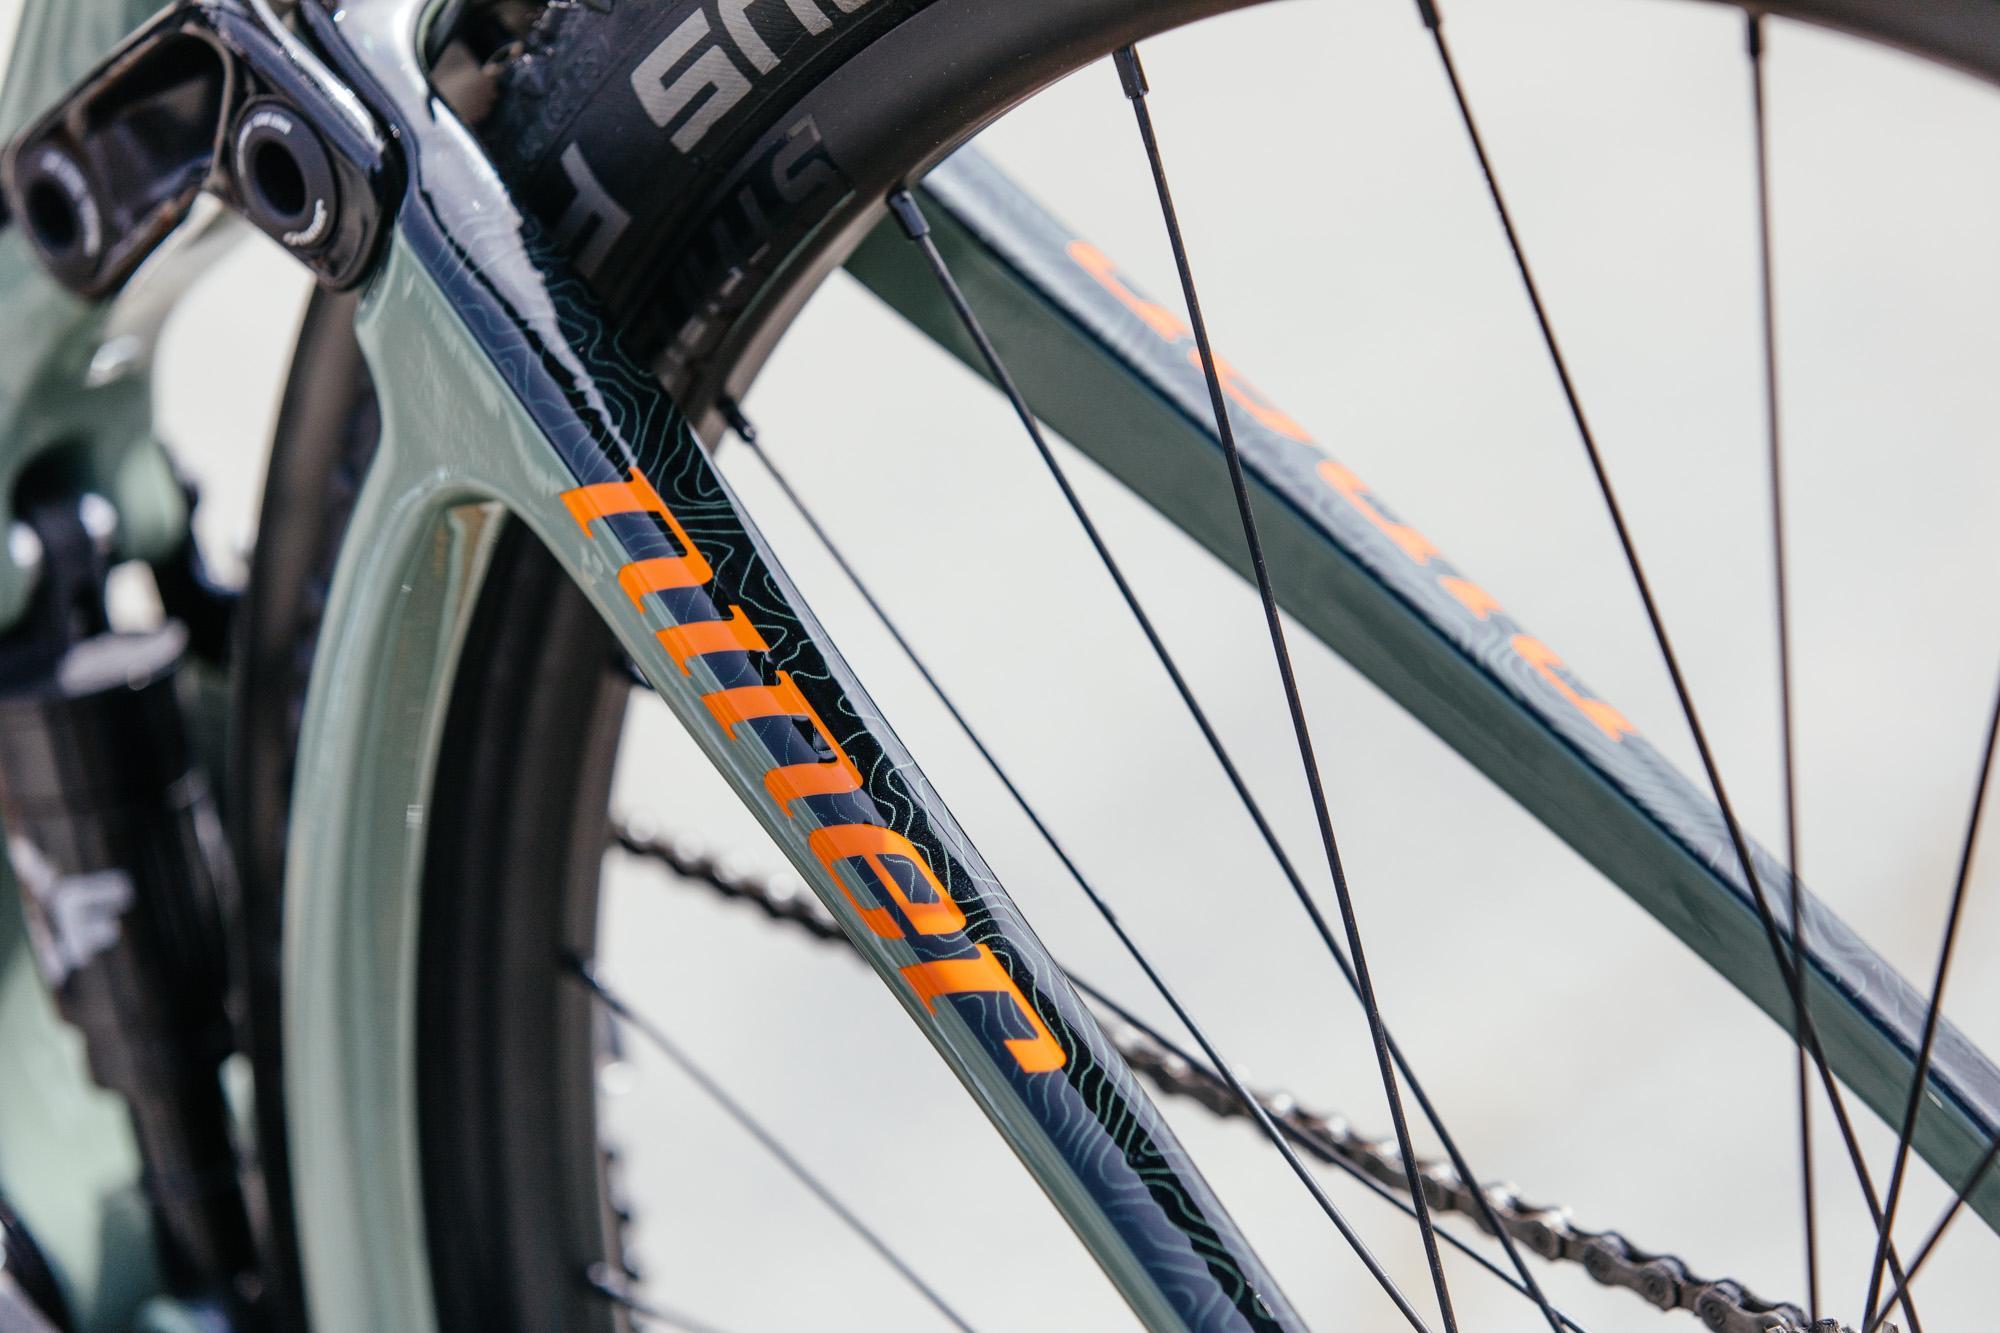 Niner Bikes' MCR 9 RDO Prototype Full Suspension All Road